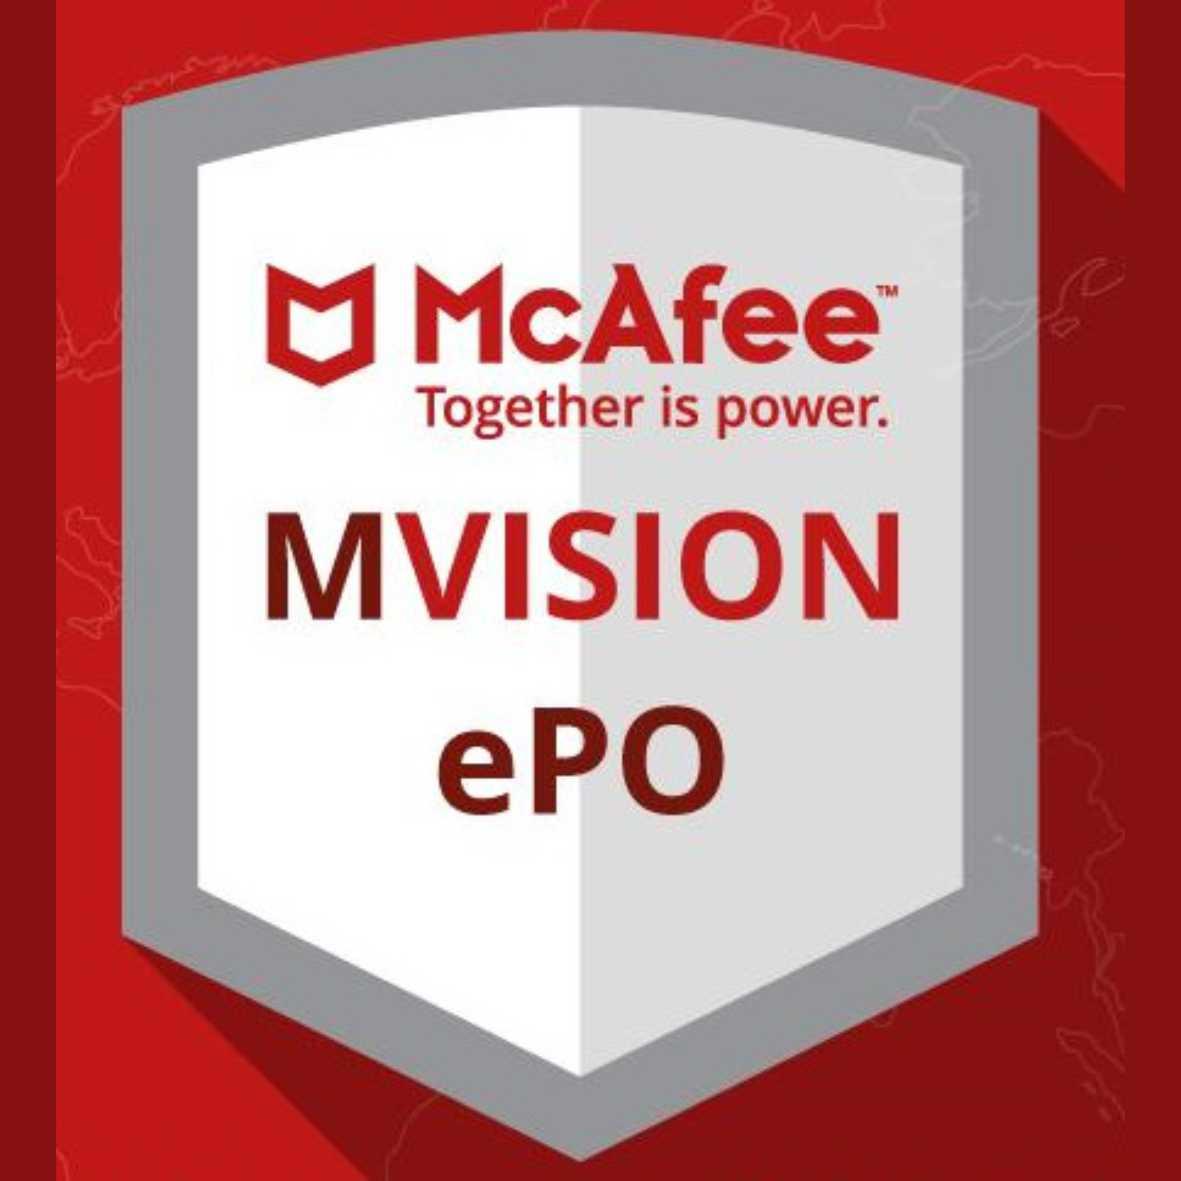 McAfee MVISION ePO